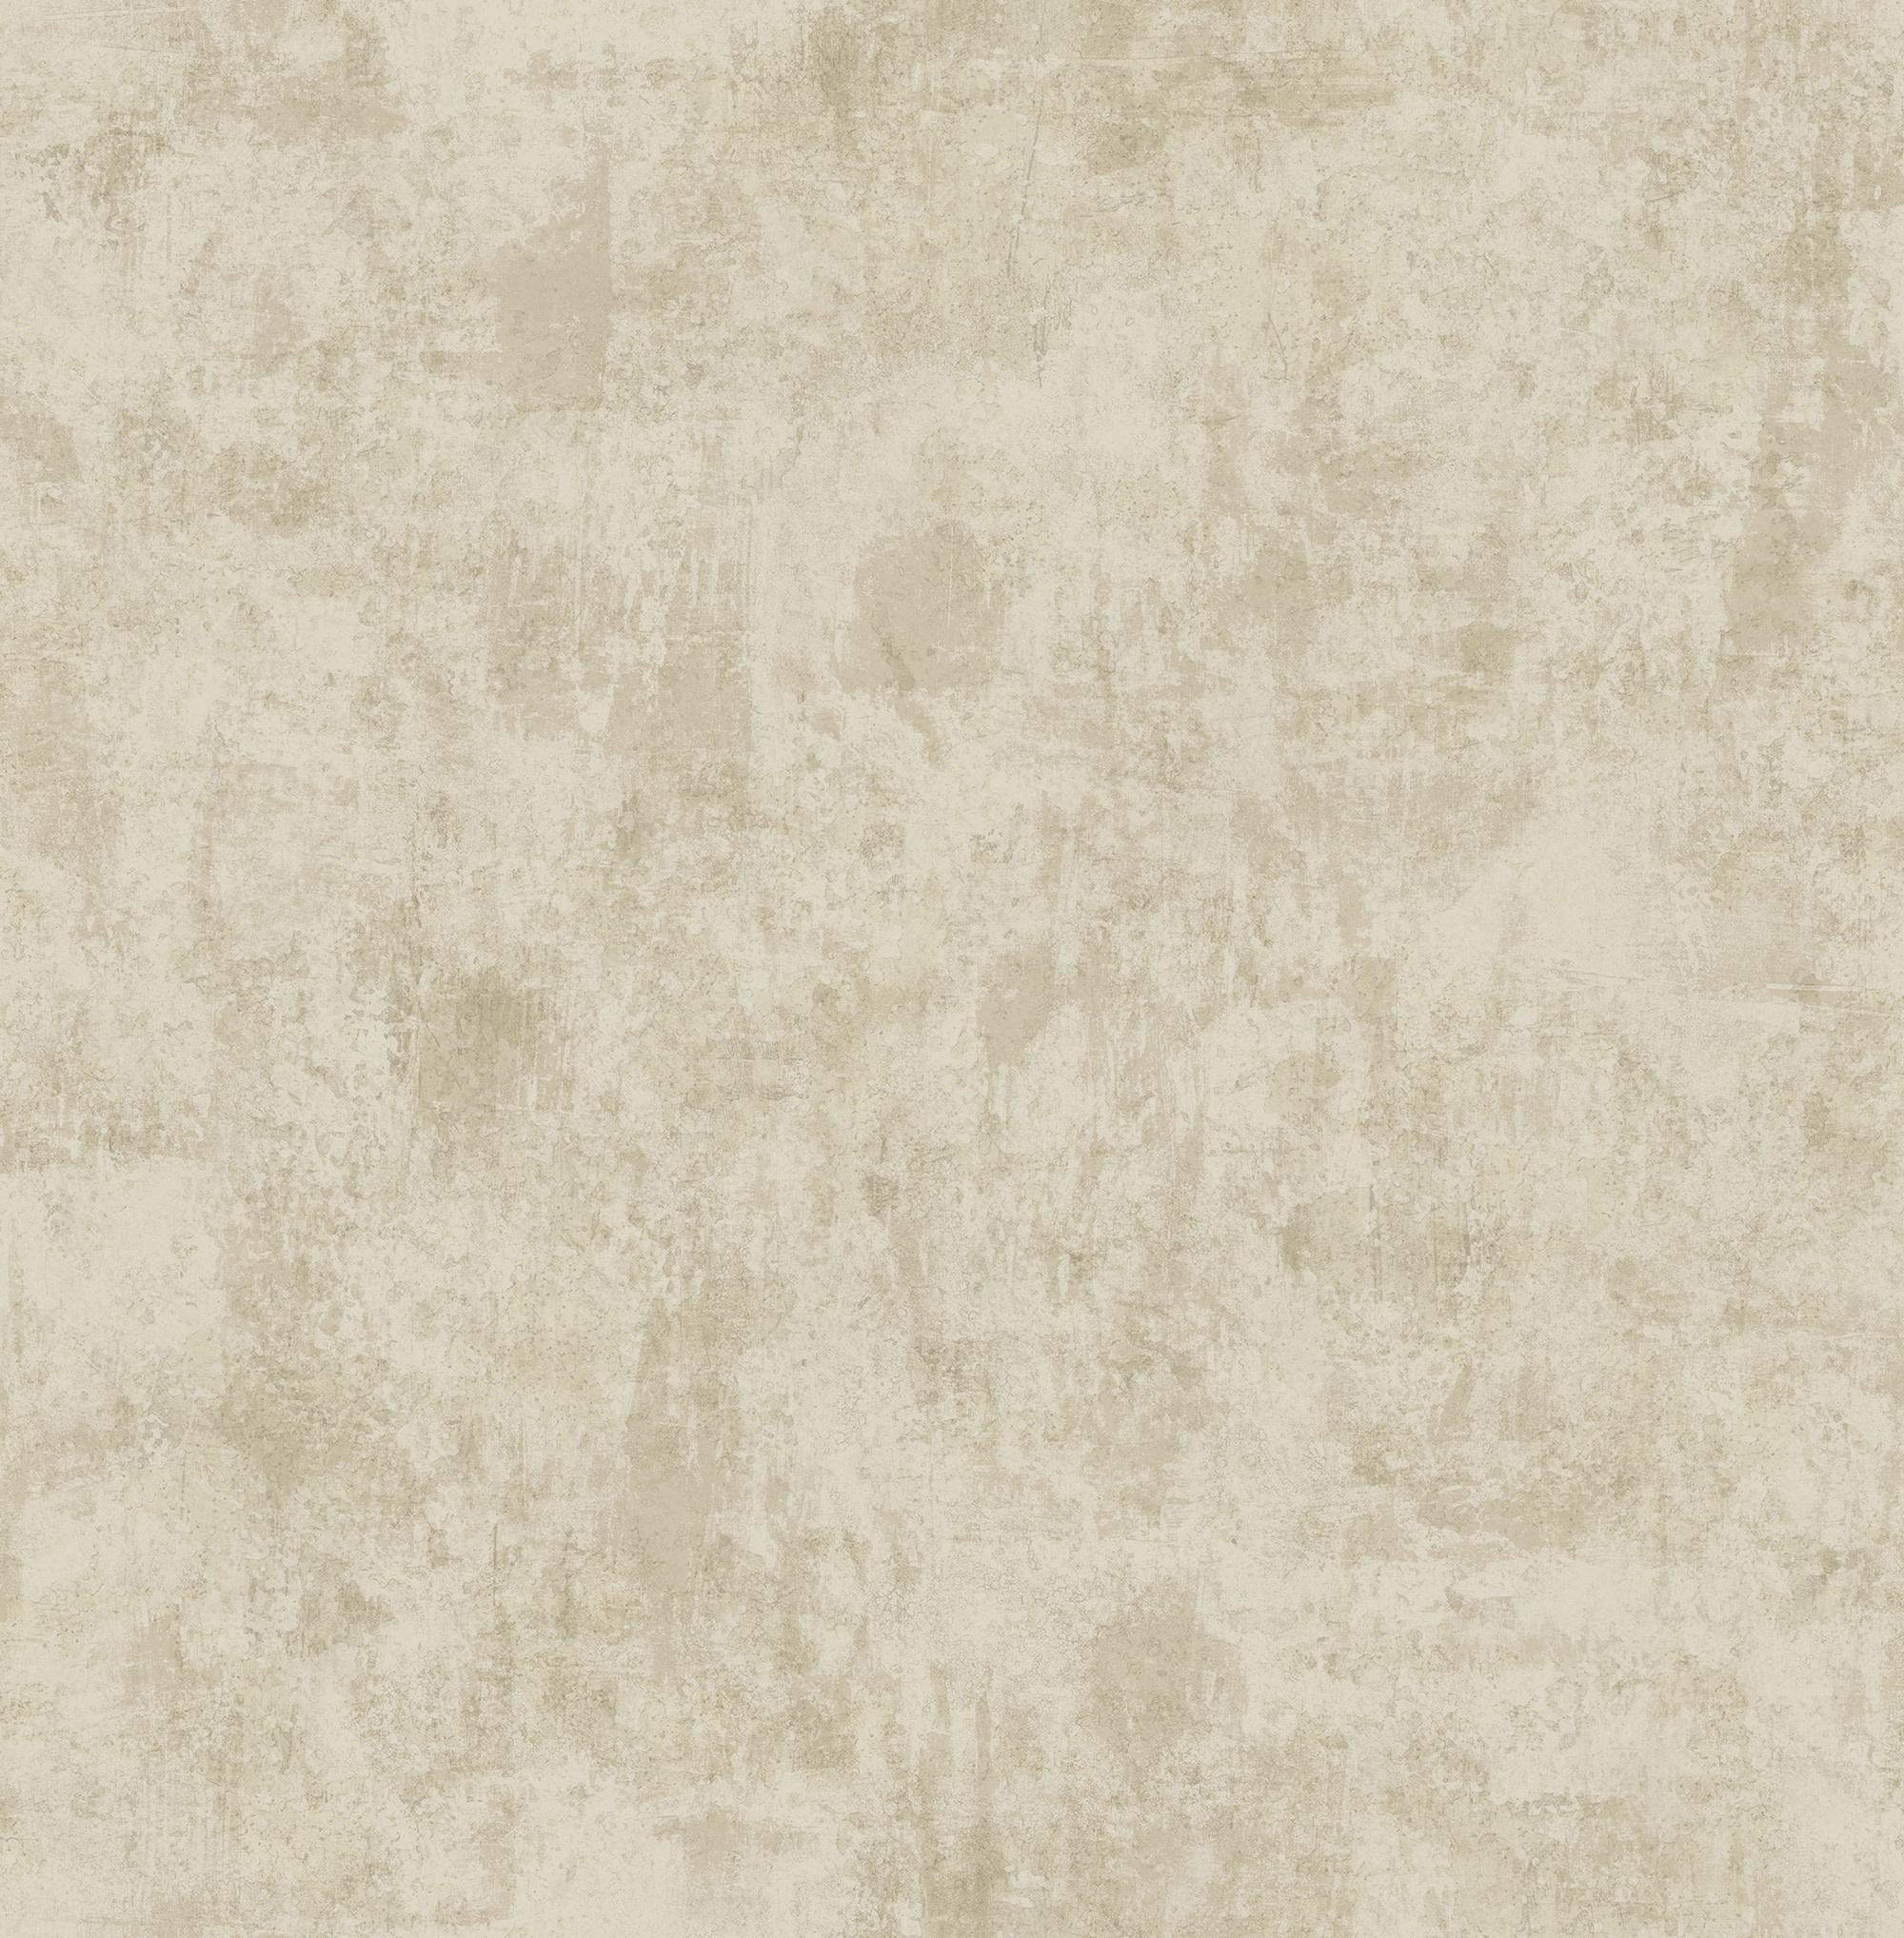 Wallquest Atelier Stucco